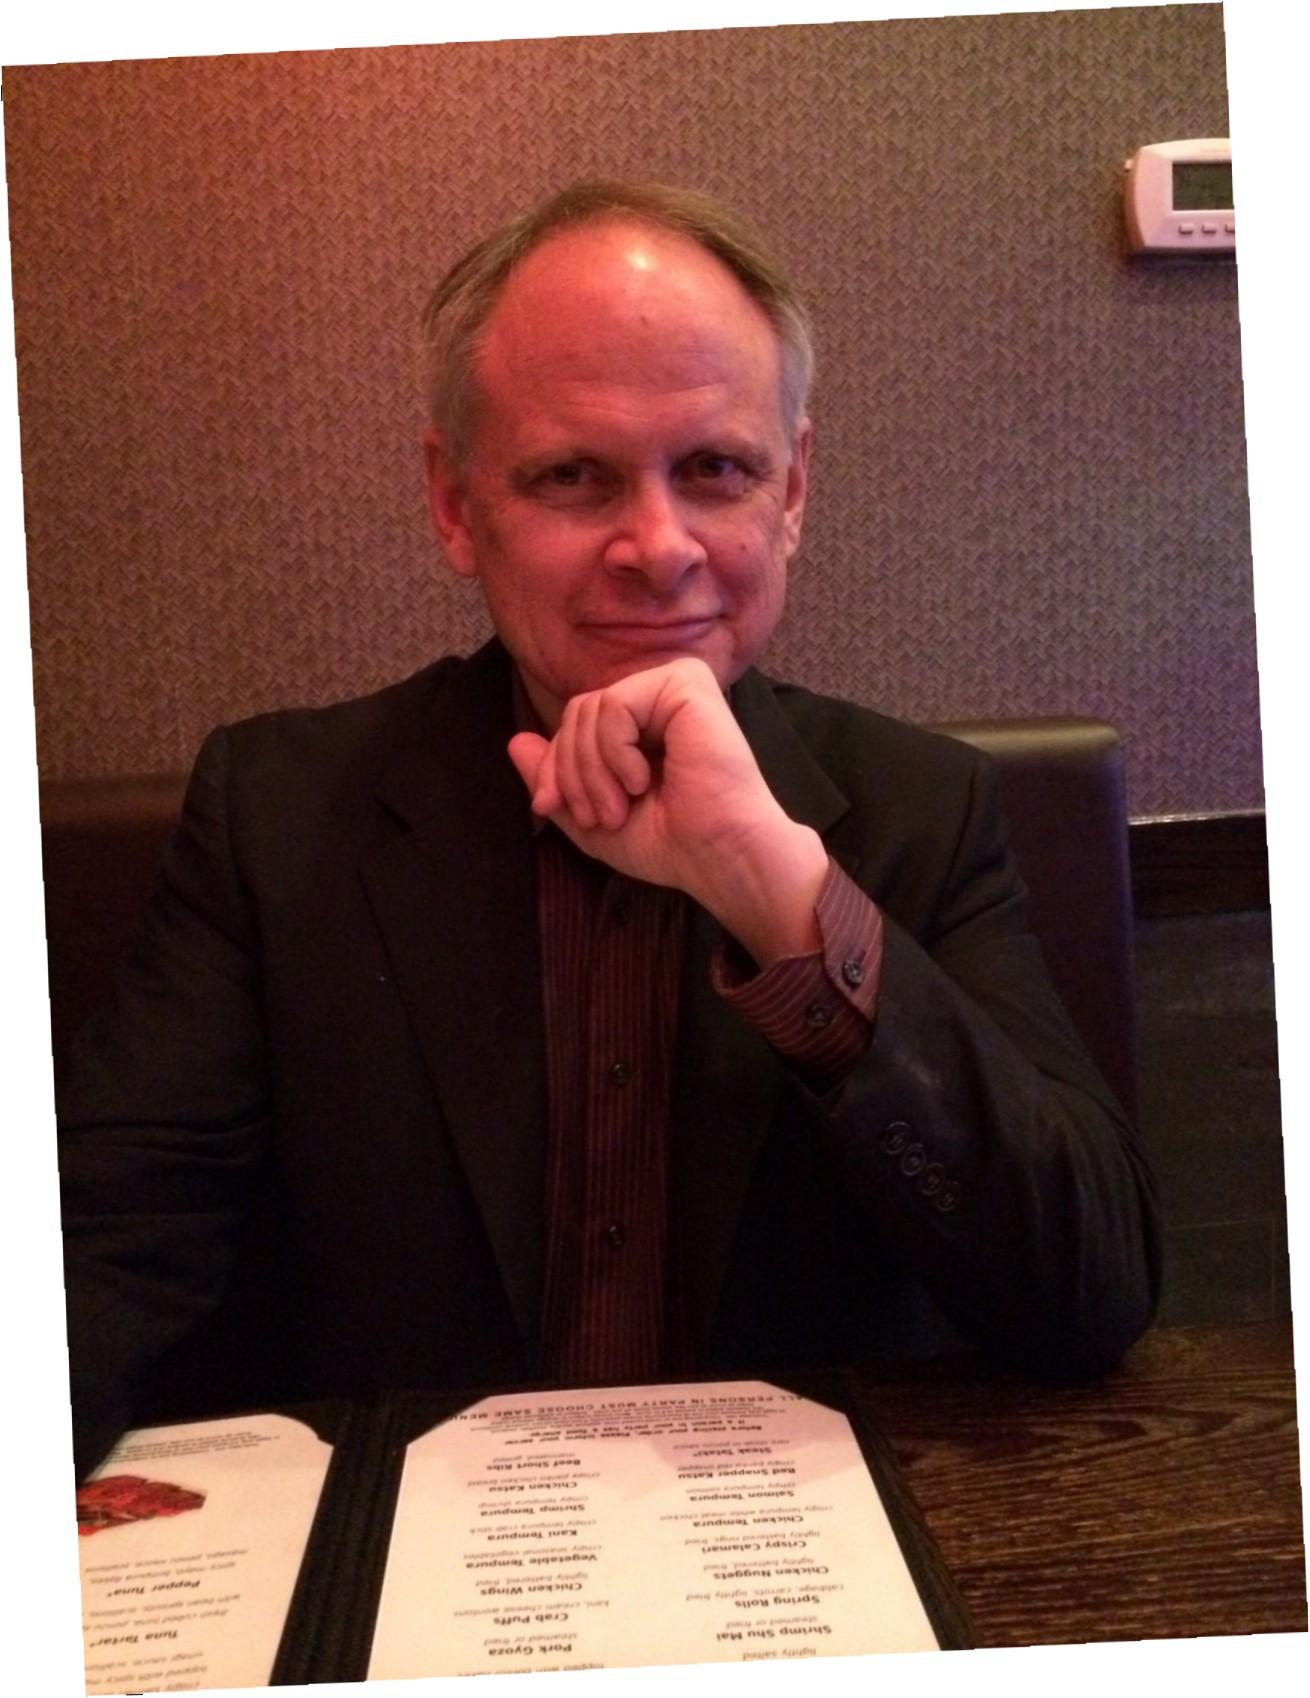 David Minton, Lumina Studio Theatre's artistic and executive director.